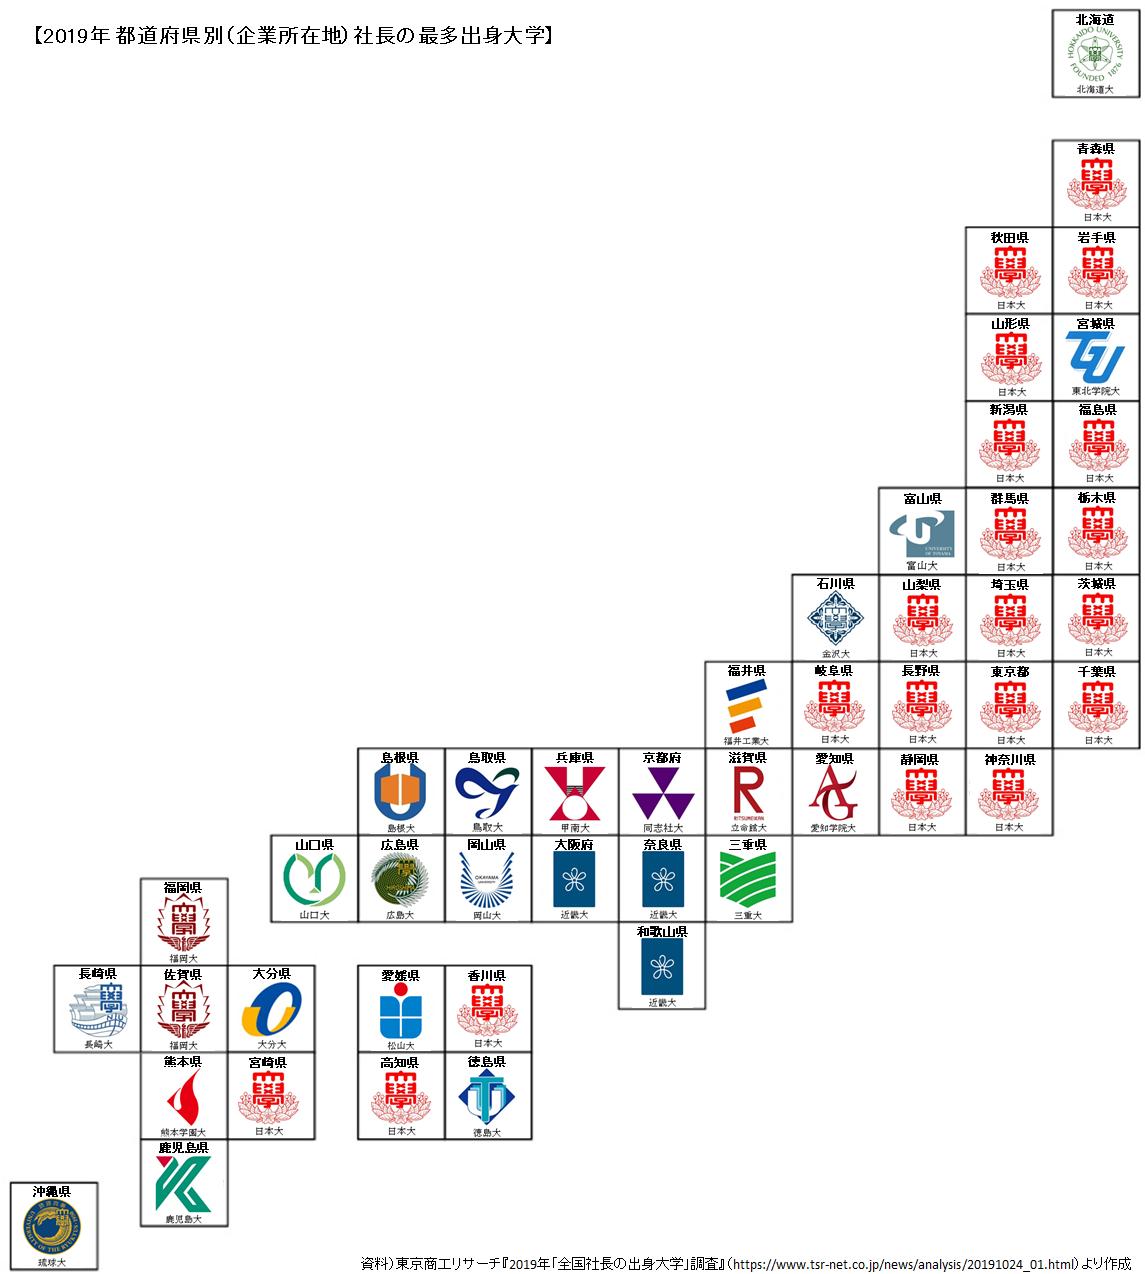 shacho2019.png